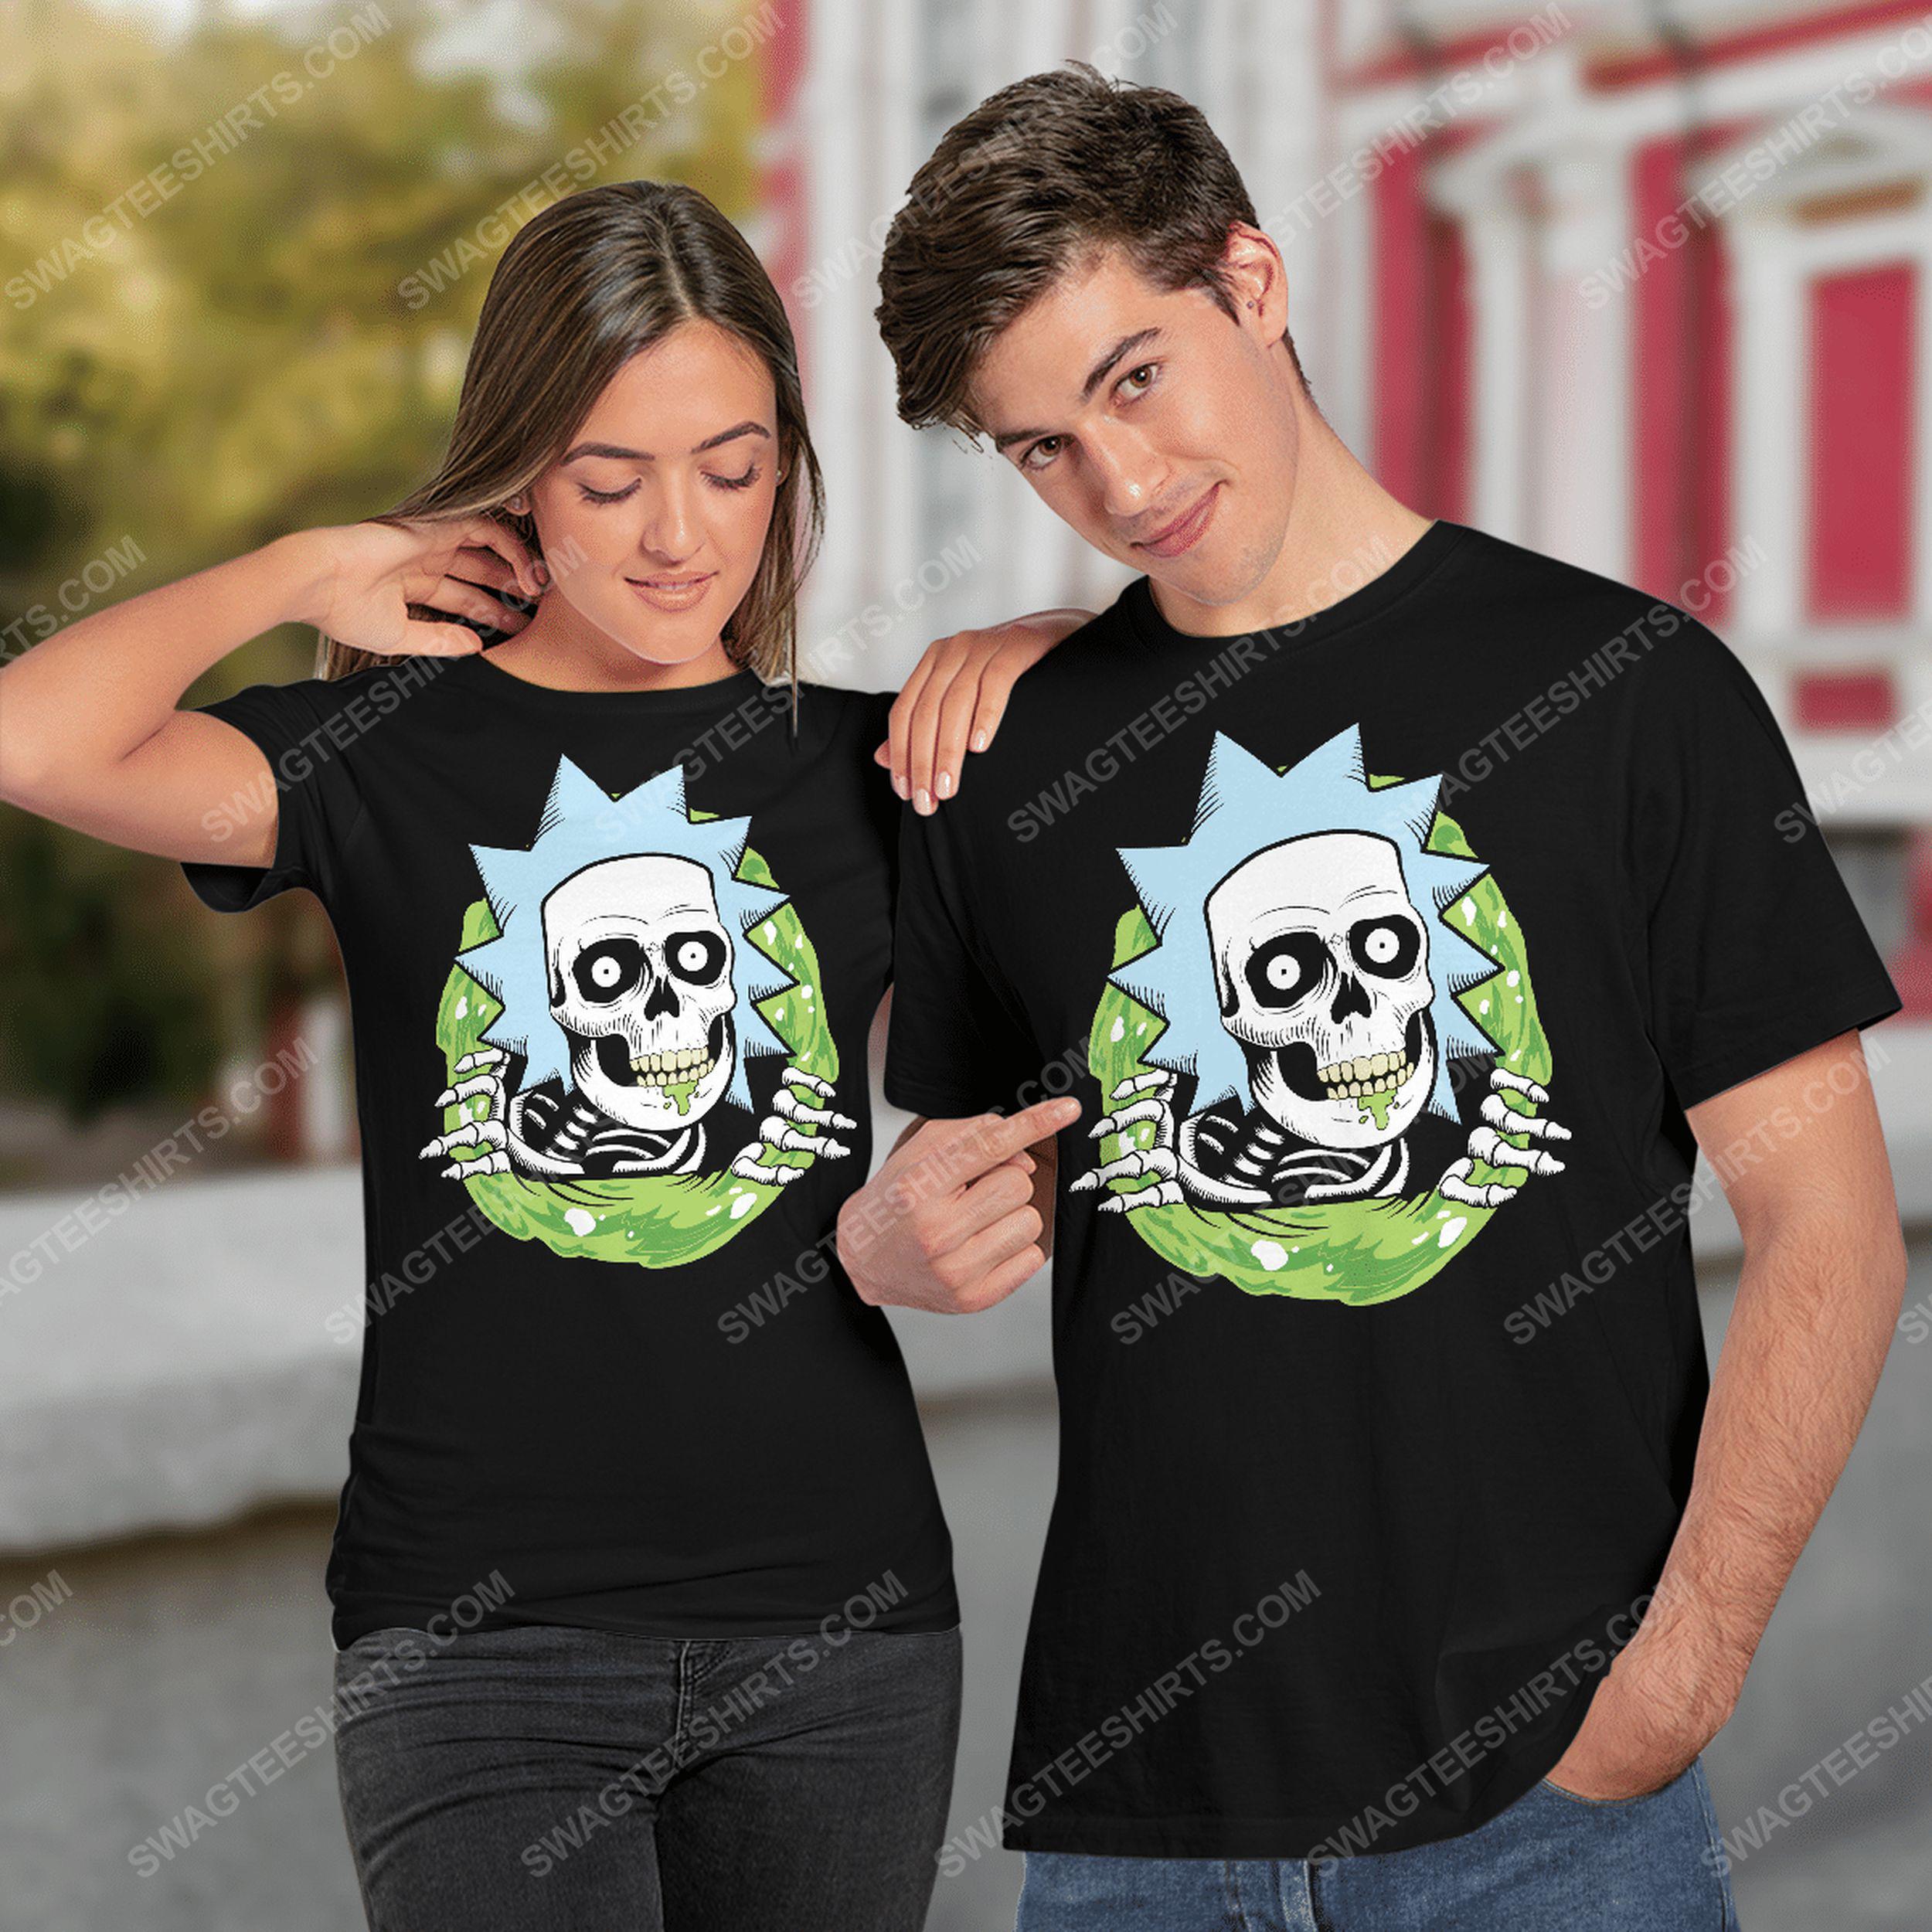 Rick and morty tv show rick sanchez skull halloween tshirt(1)